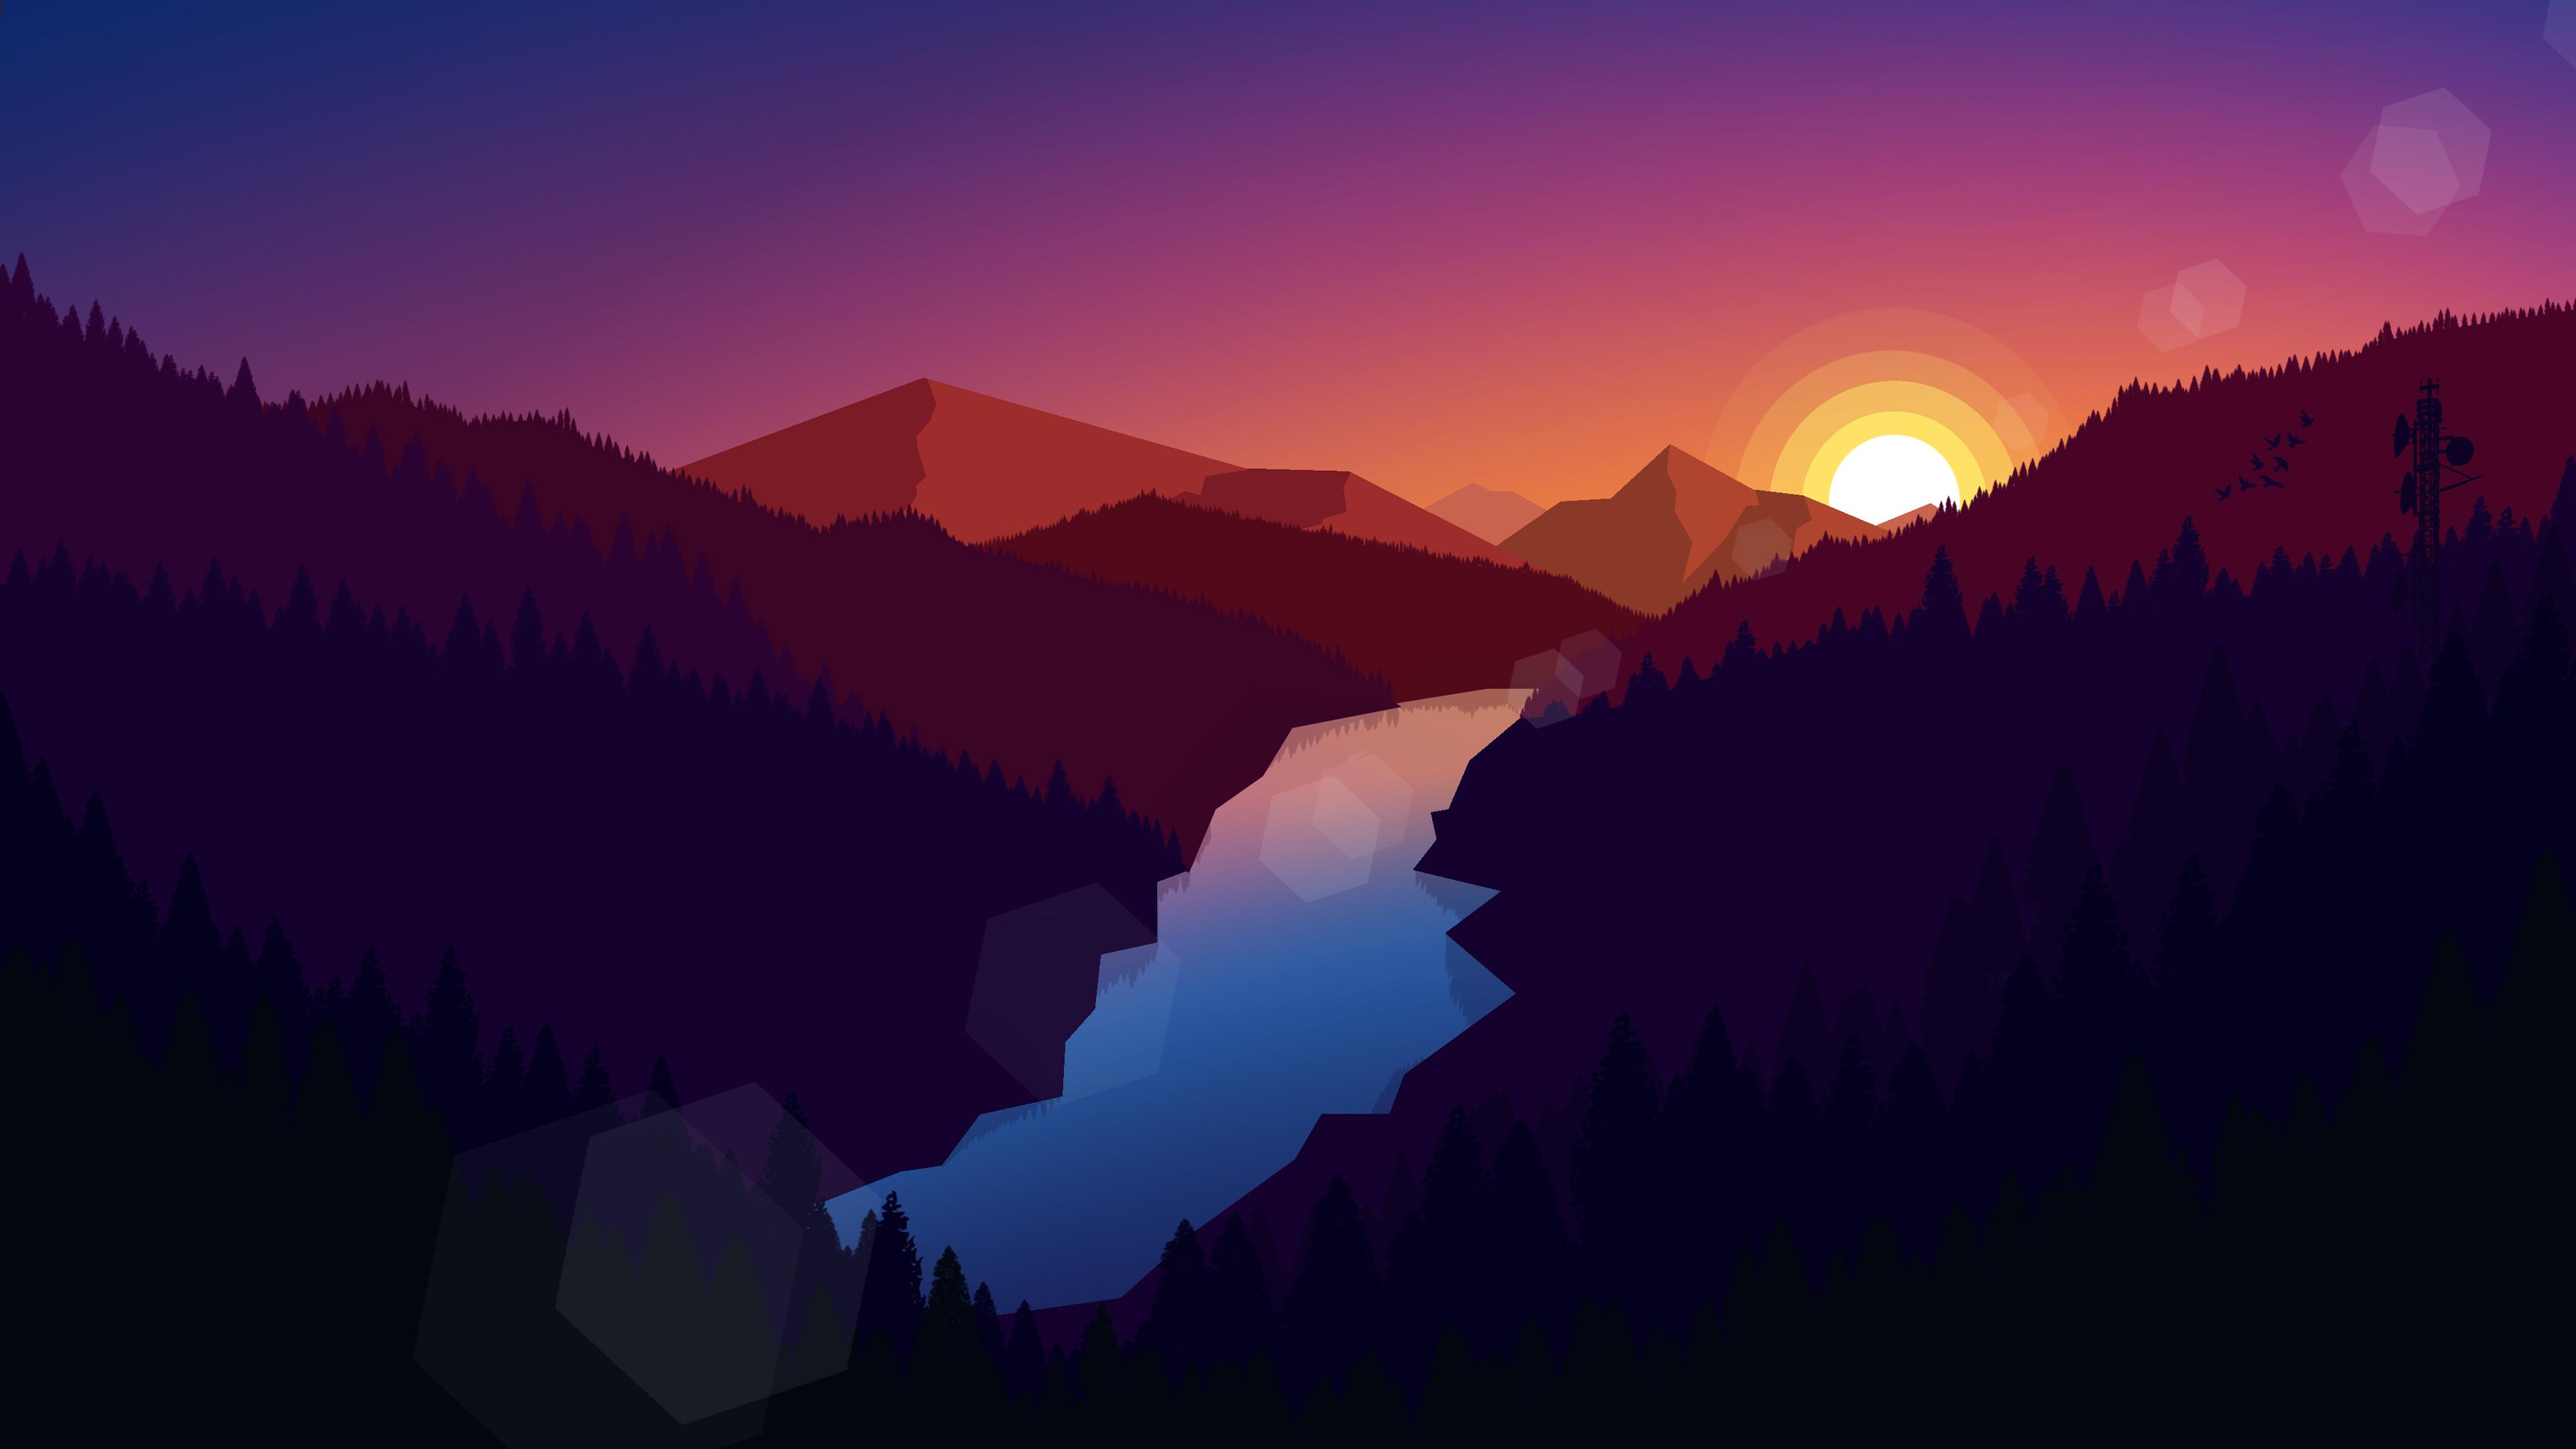 Recovery Mountain Minimalist 4k Hd Desktop Wallpaper For: Forest Dark Evening Sunset Last Light Minimalistic, HD